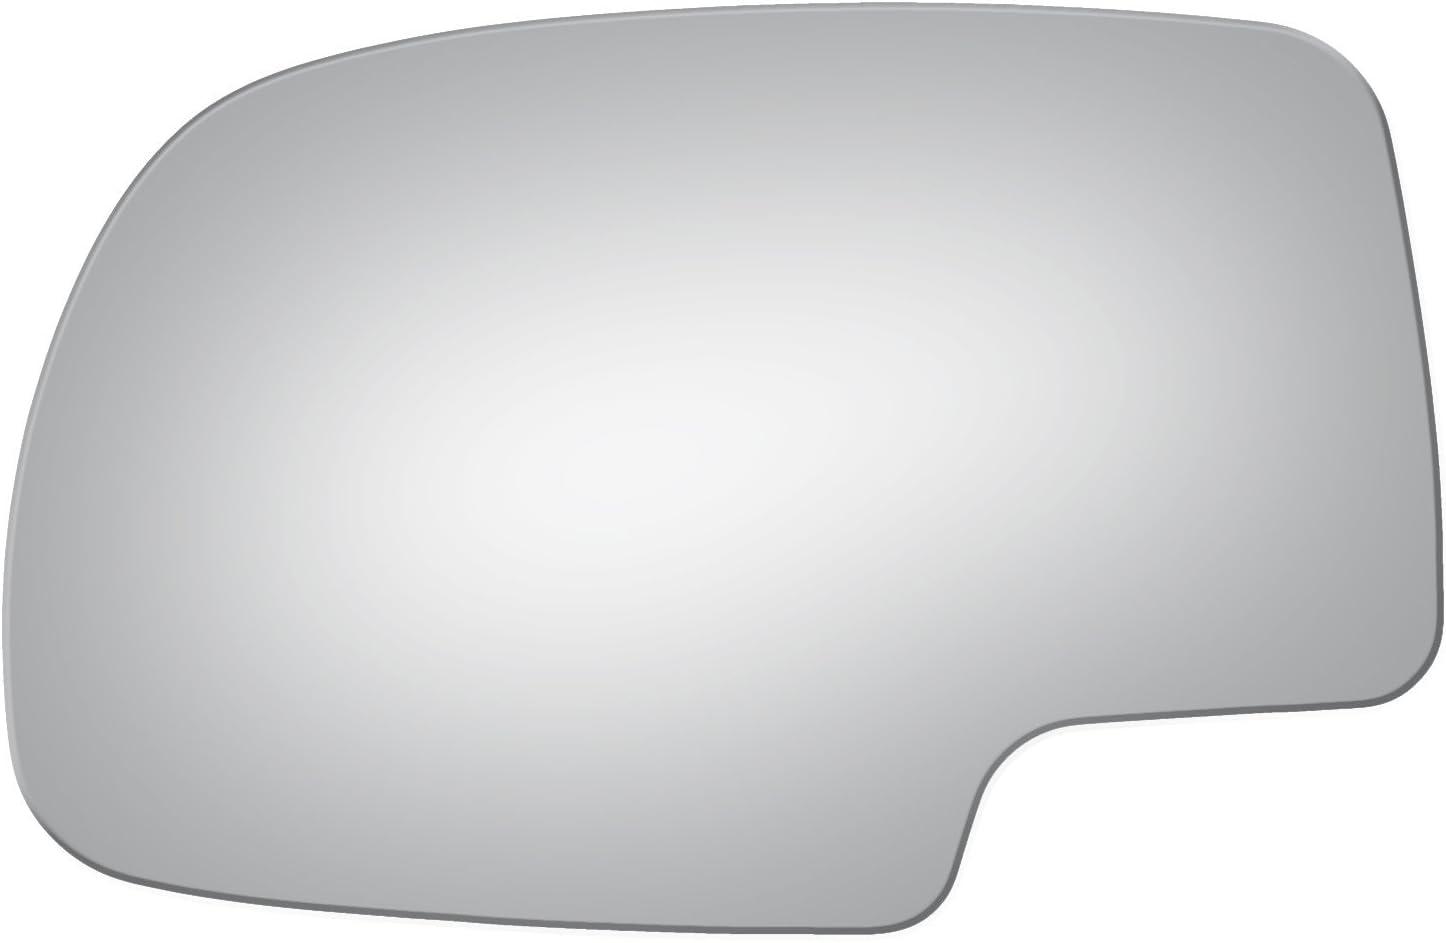 Replacement Mirror Glass for Chevrolet Silverado 2000-2006 SUBURBAN TAHOE YUKON XL Driver Side 1999 2000 2001 2002 2003 2004 2005 2006 2007 GMC SIERRA YUKON - Part Link #: GM1323633 Burco GLASS ONLY